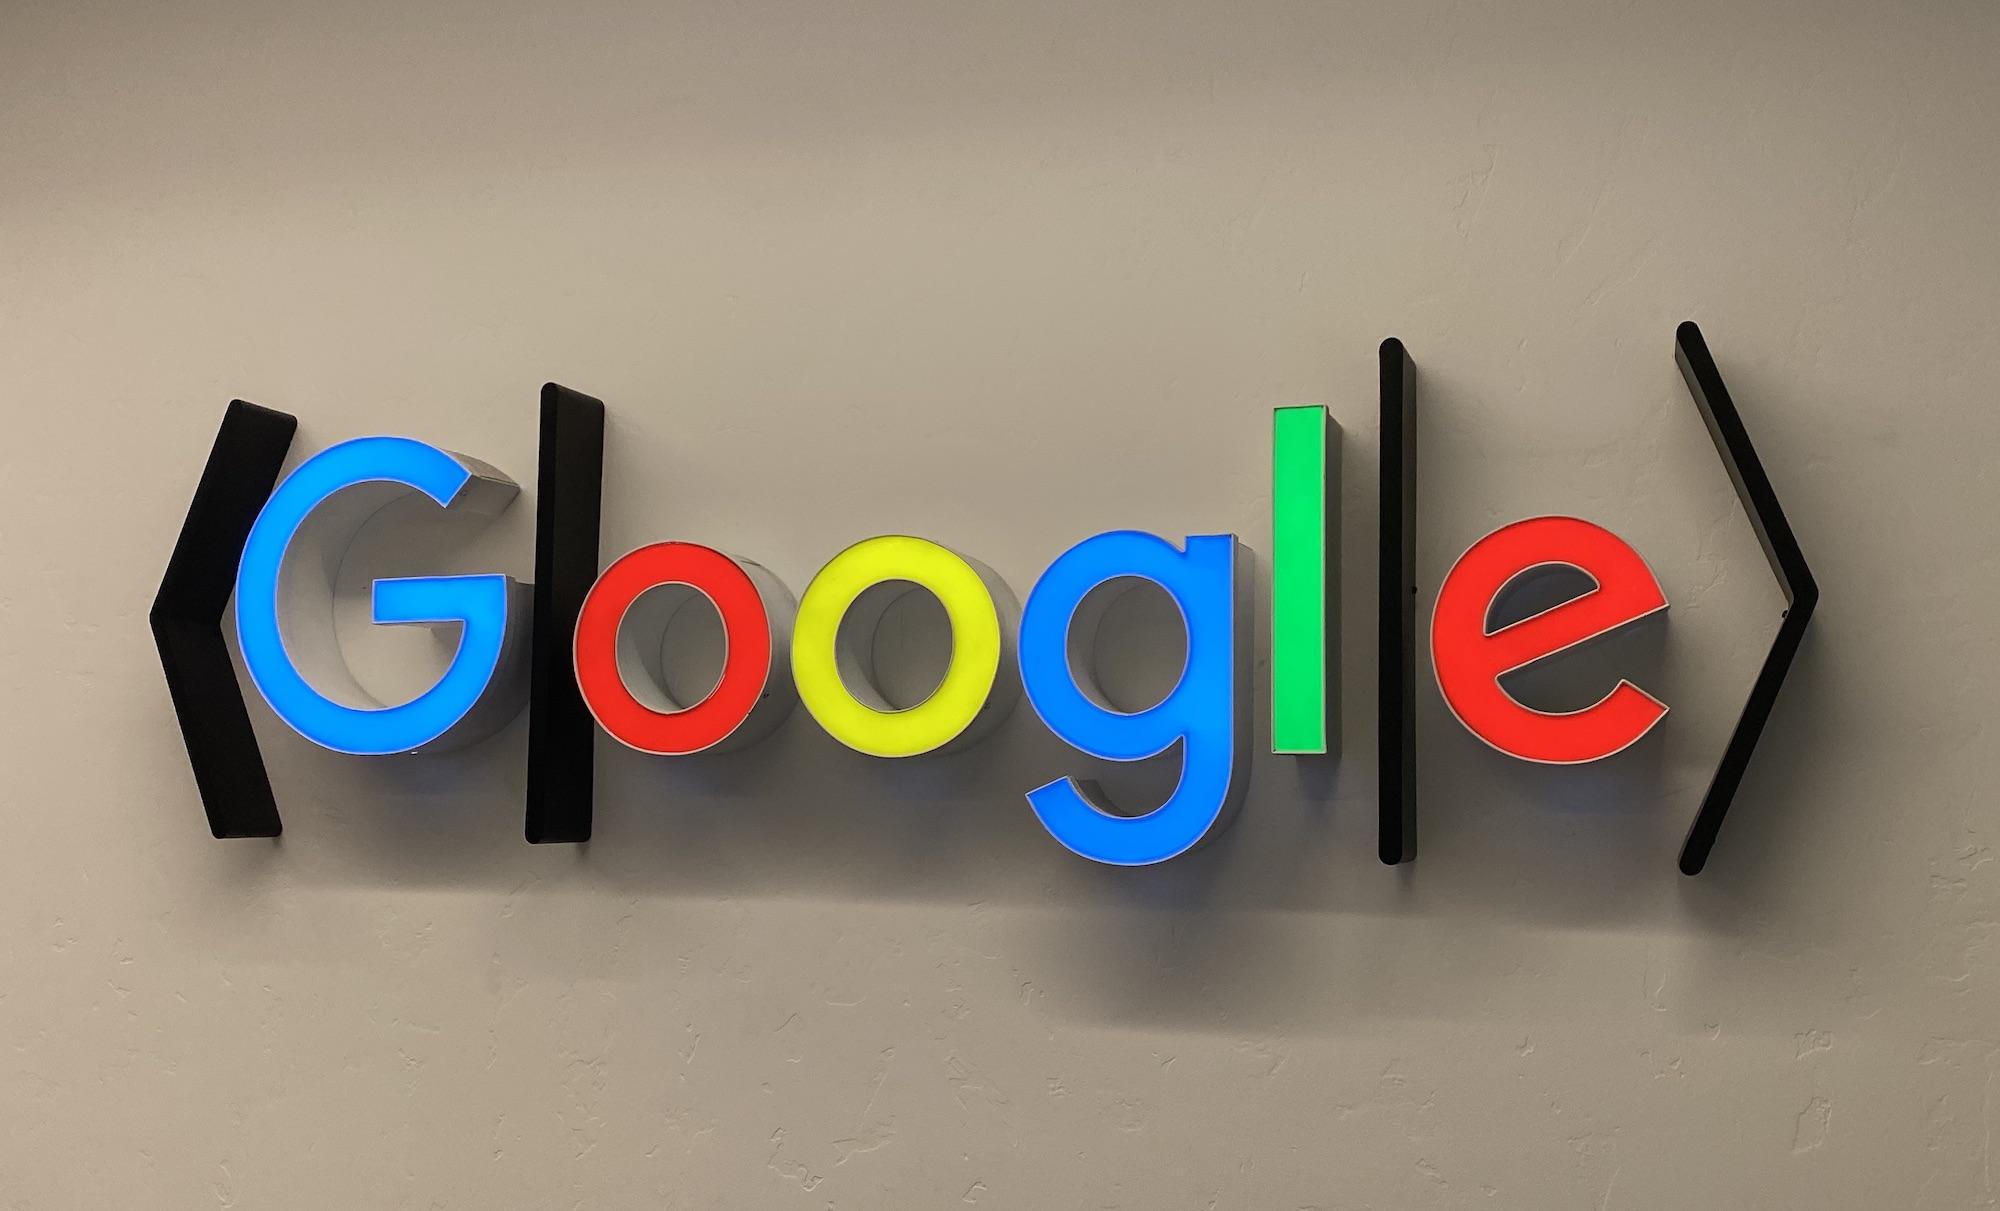 The Santa Barbara crowd has given the Google logo a distinctly quantum twist.